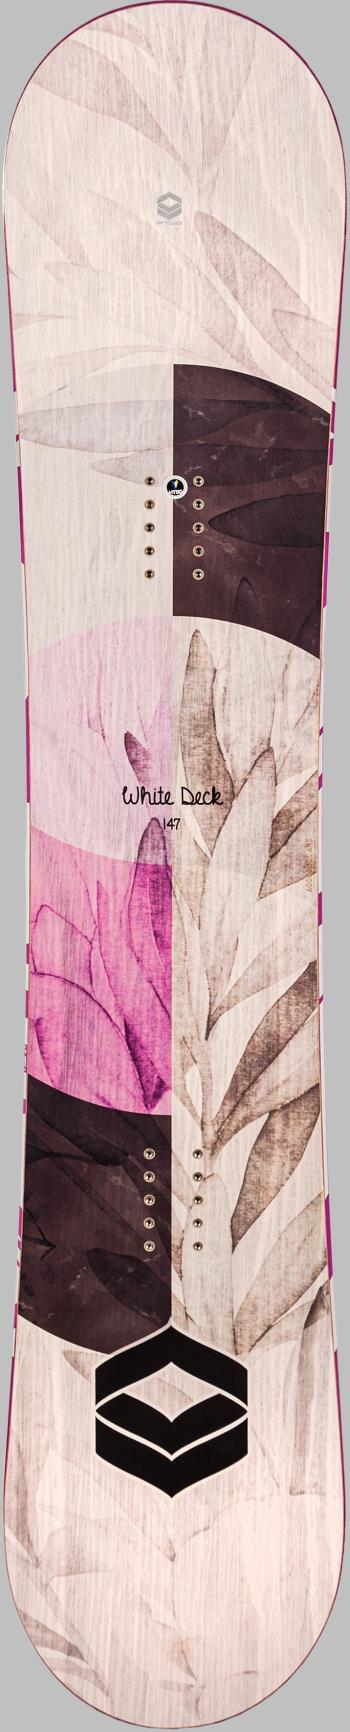 *NEW* Whitedeck Wood - Top